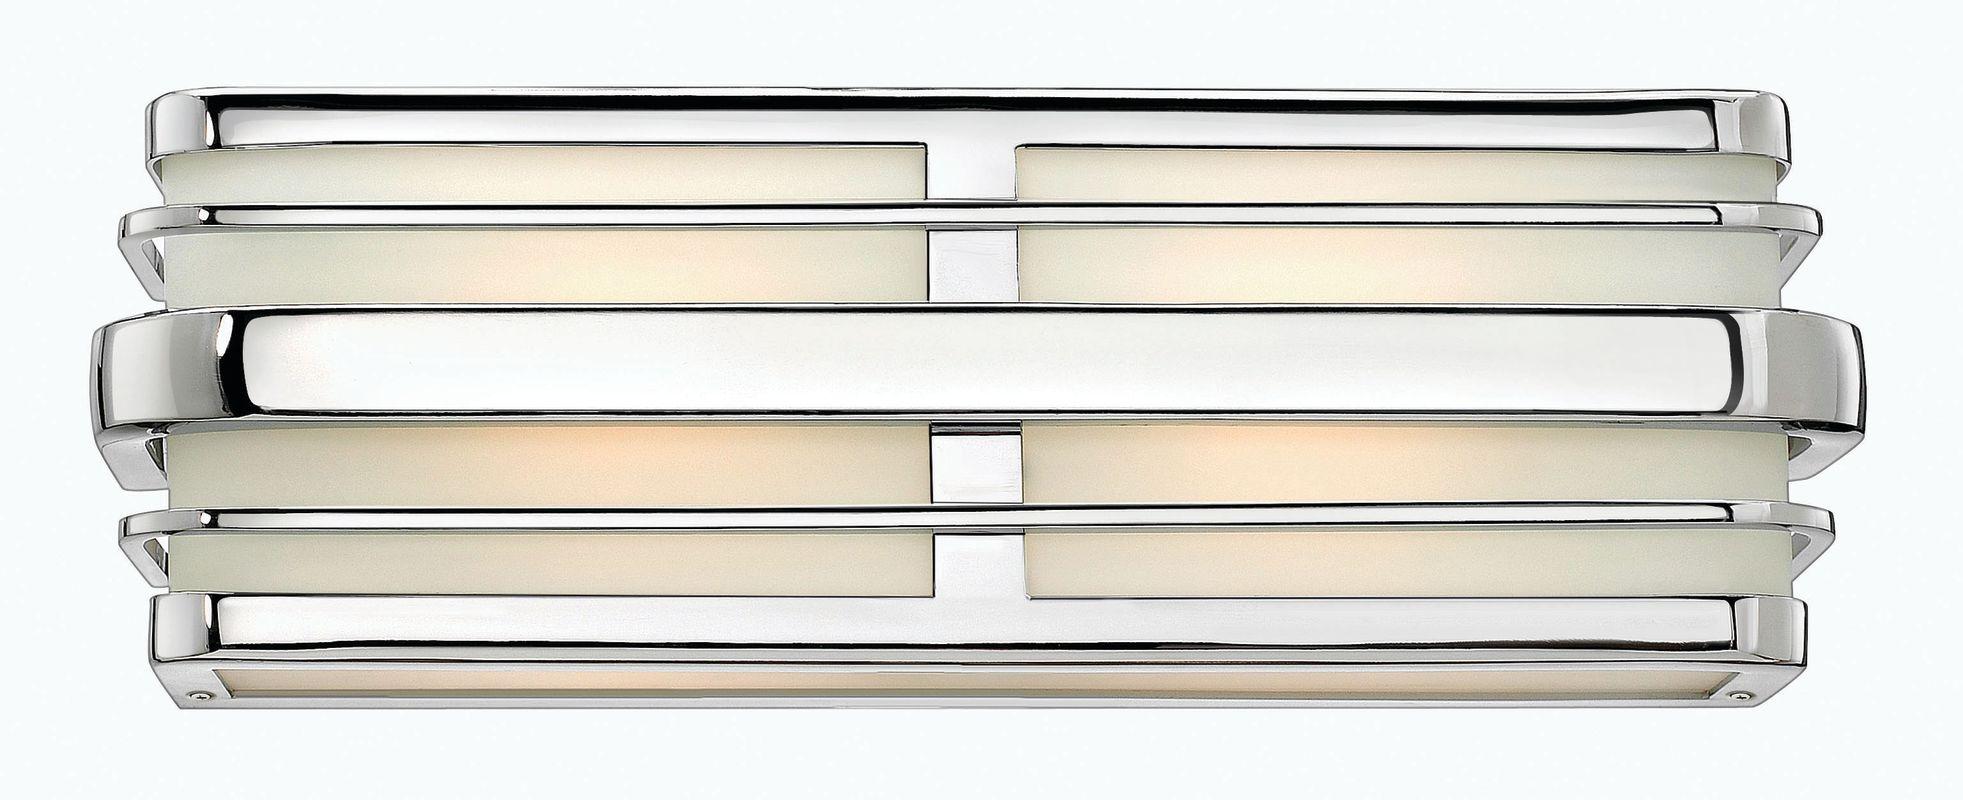 Hinkley Lighting 5232-GU24 2 Light Title 24 Fluorescent Bath Bar from